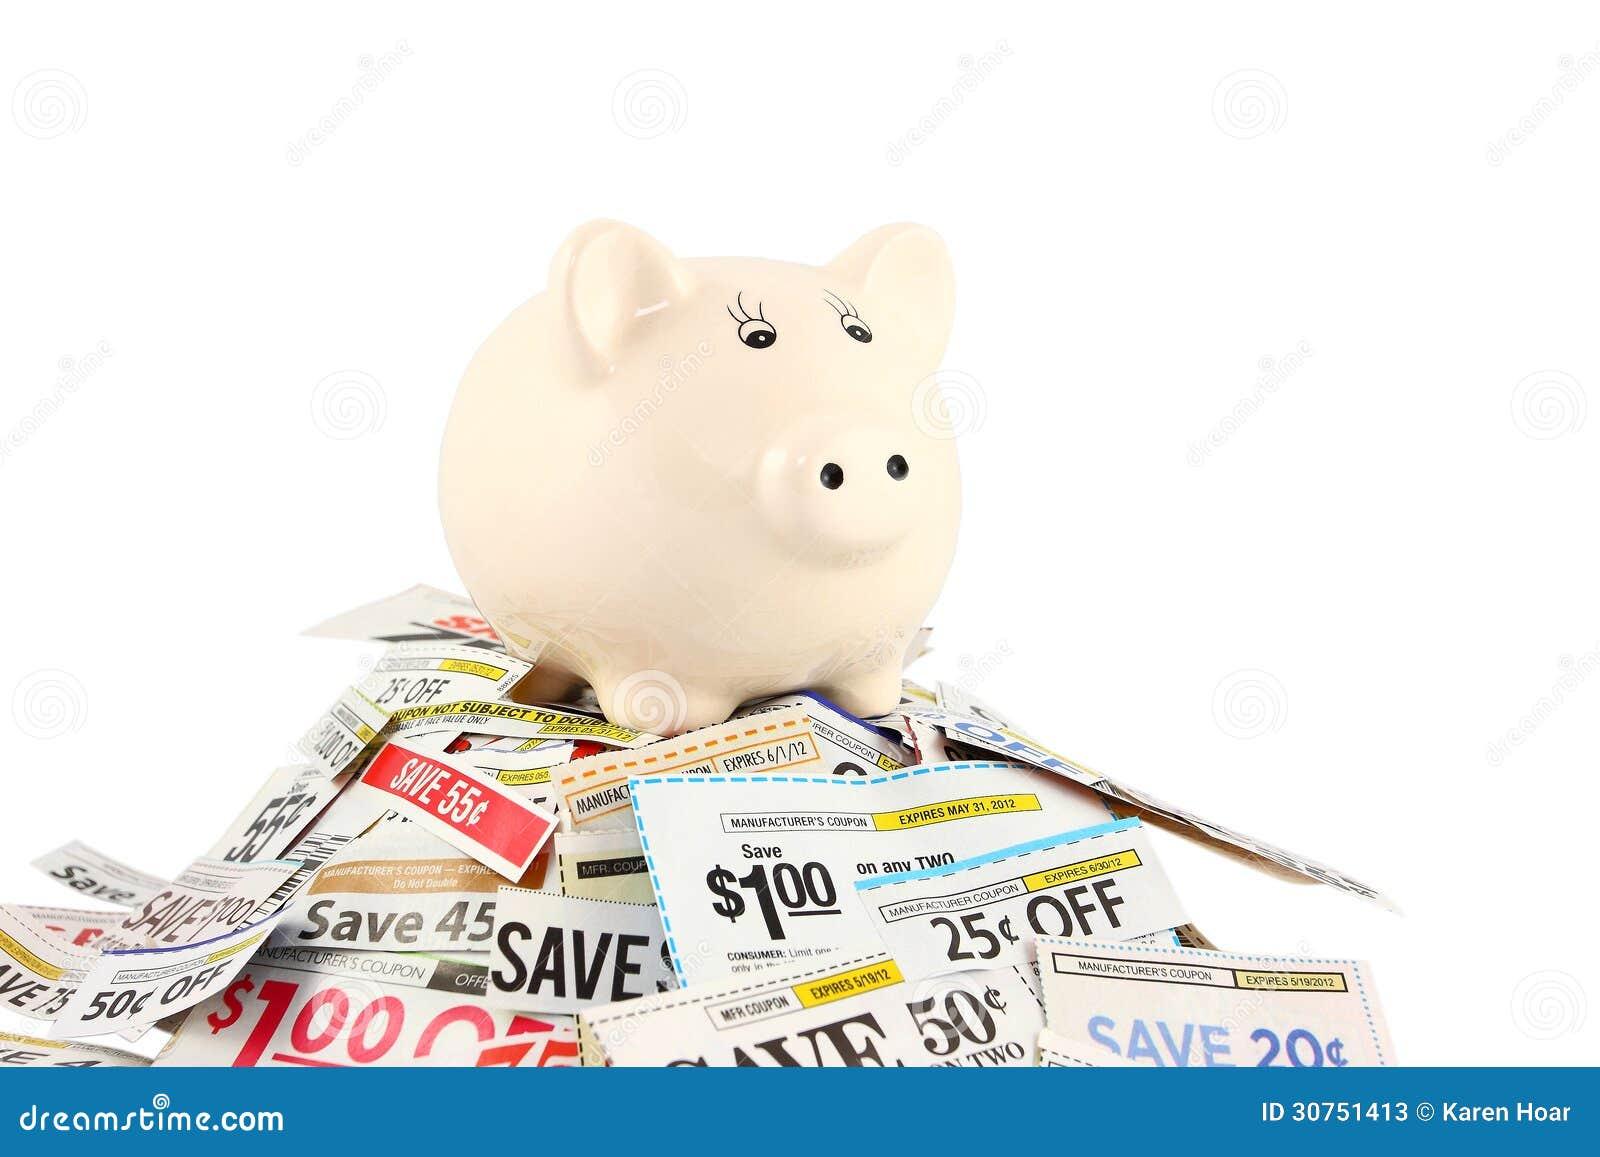 Bank coupons